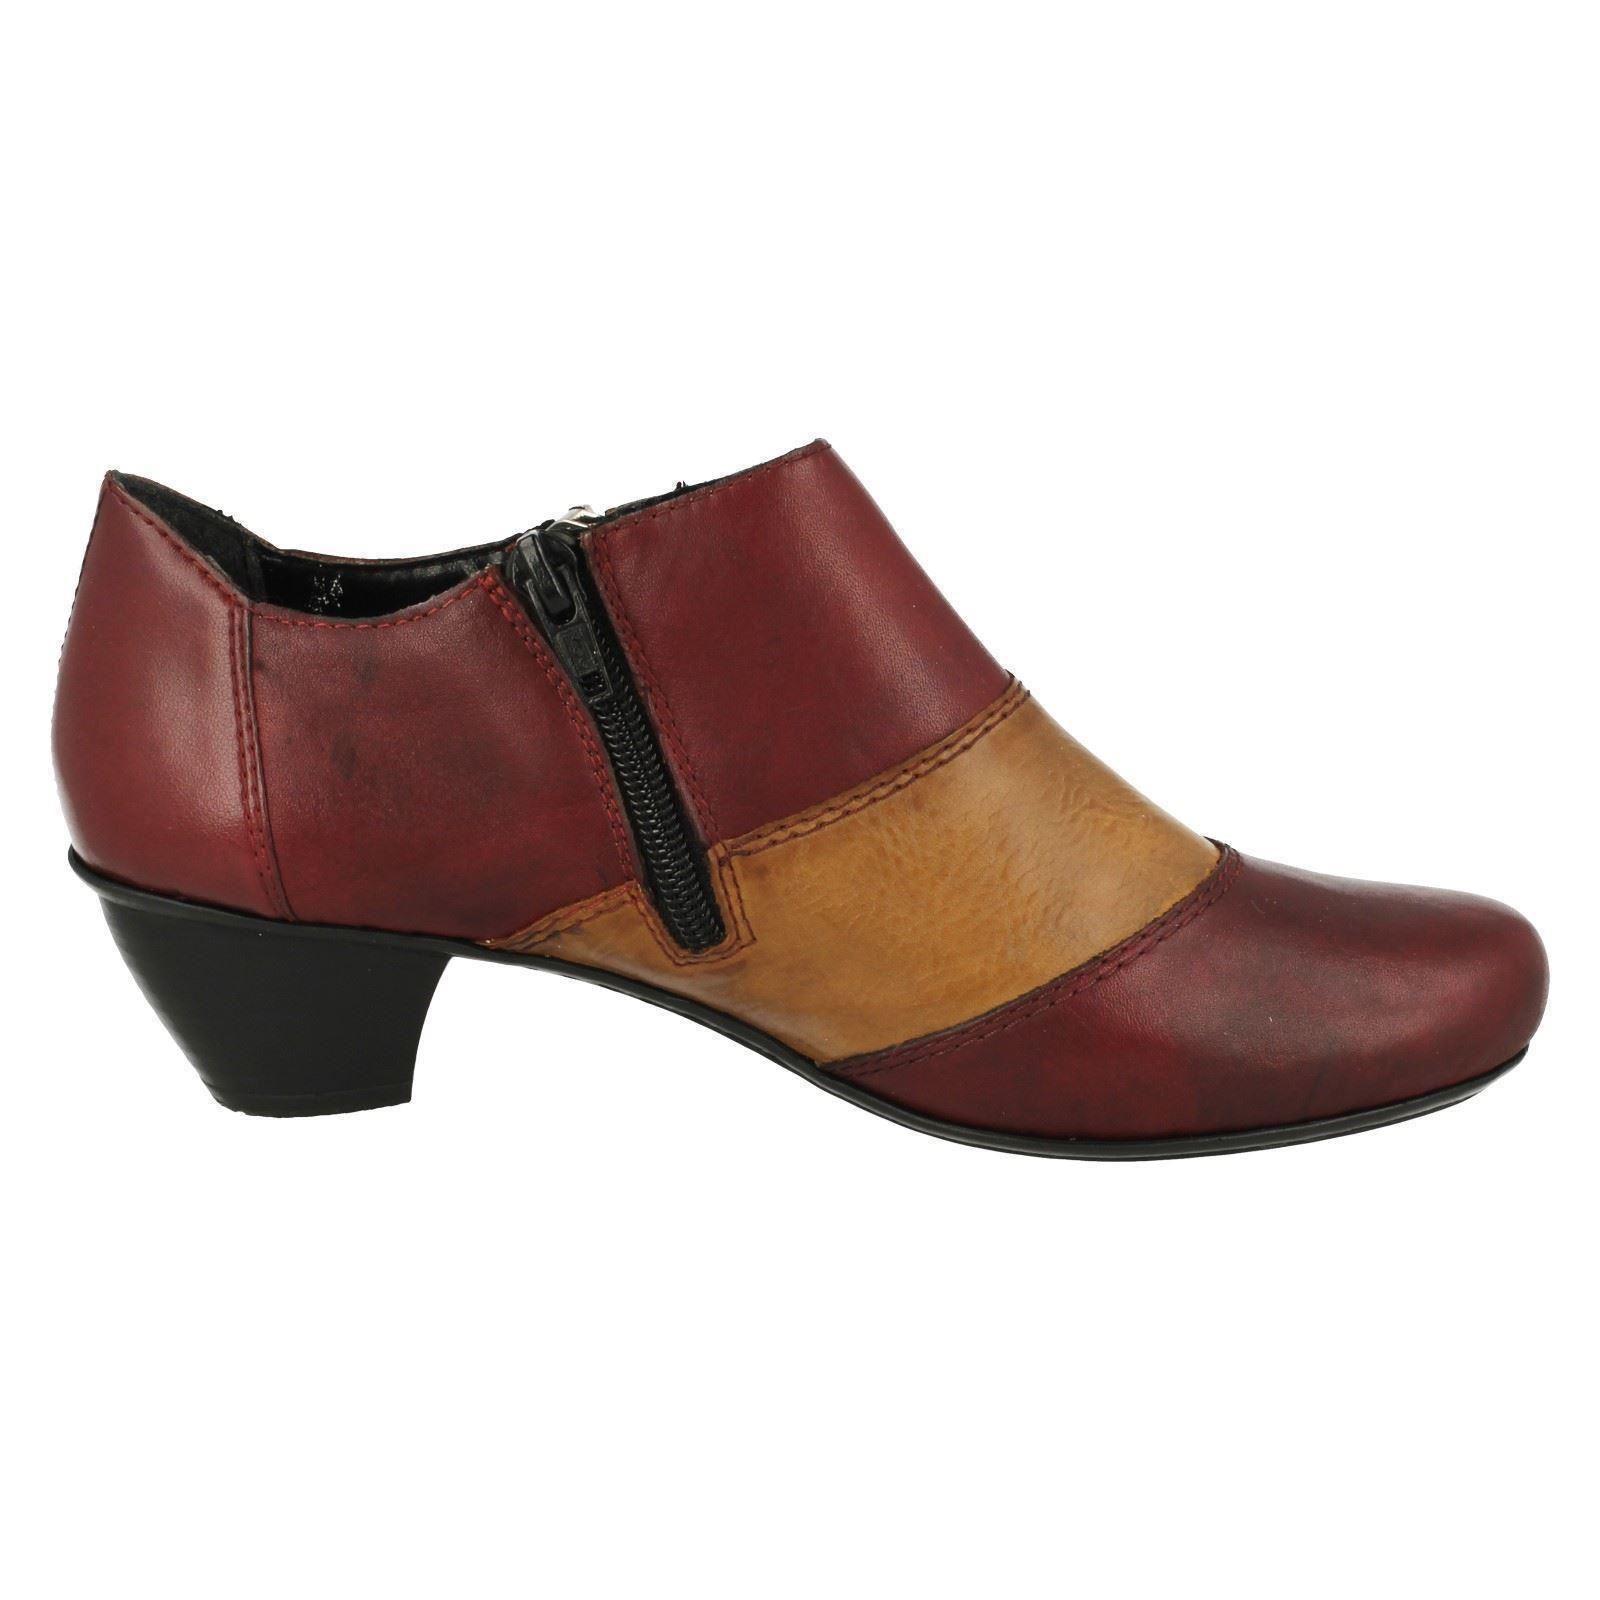 Rieker Antistress Ladies Shoes